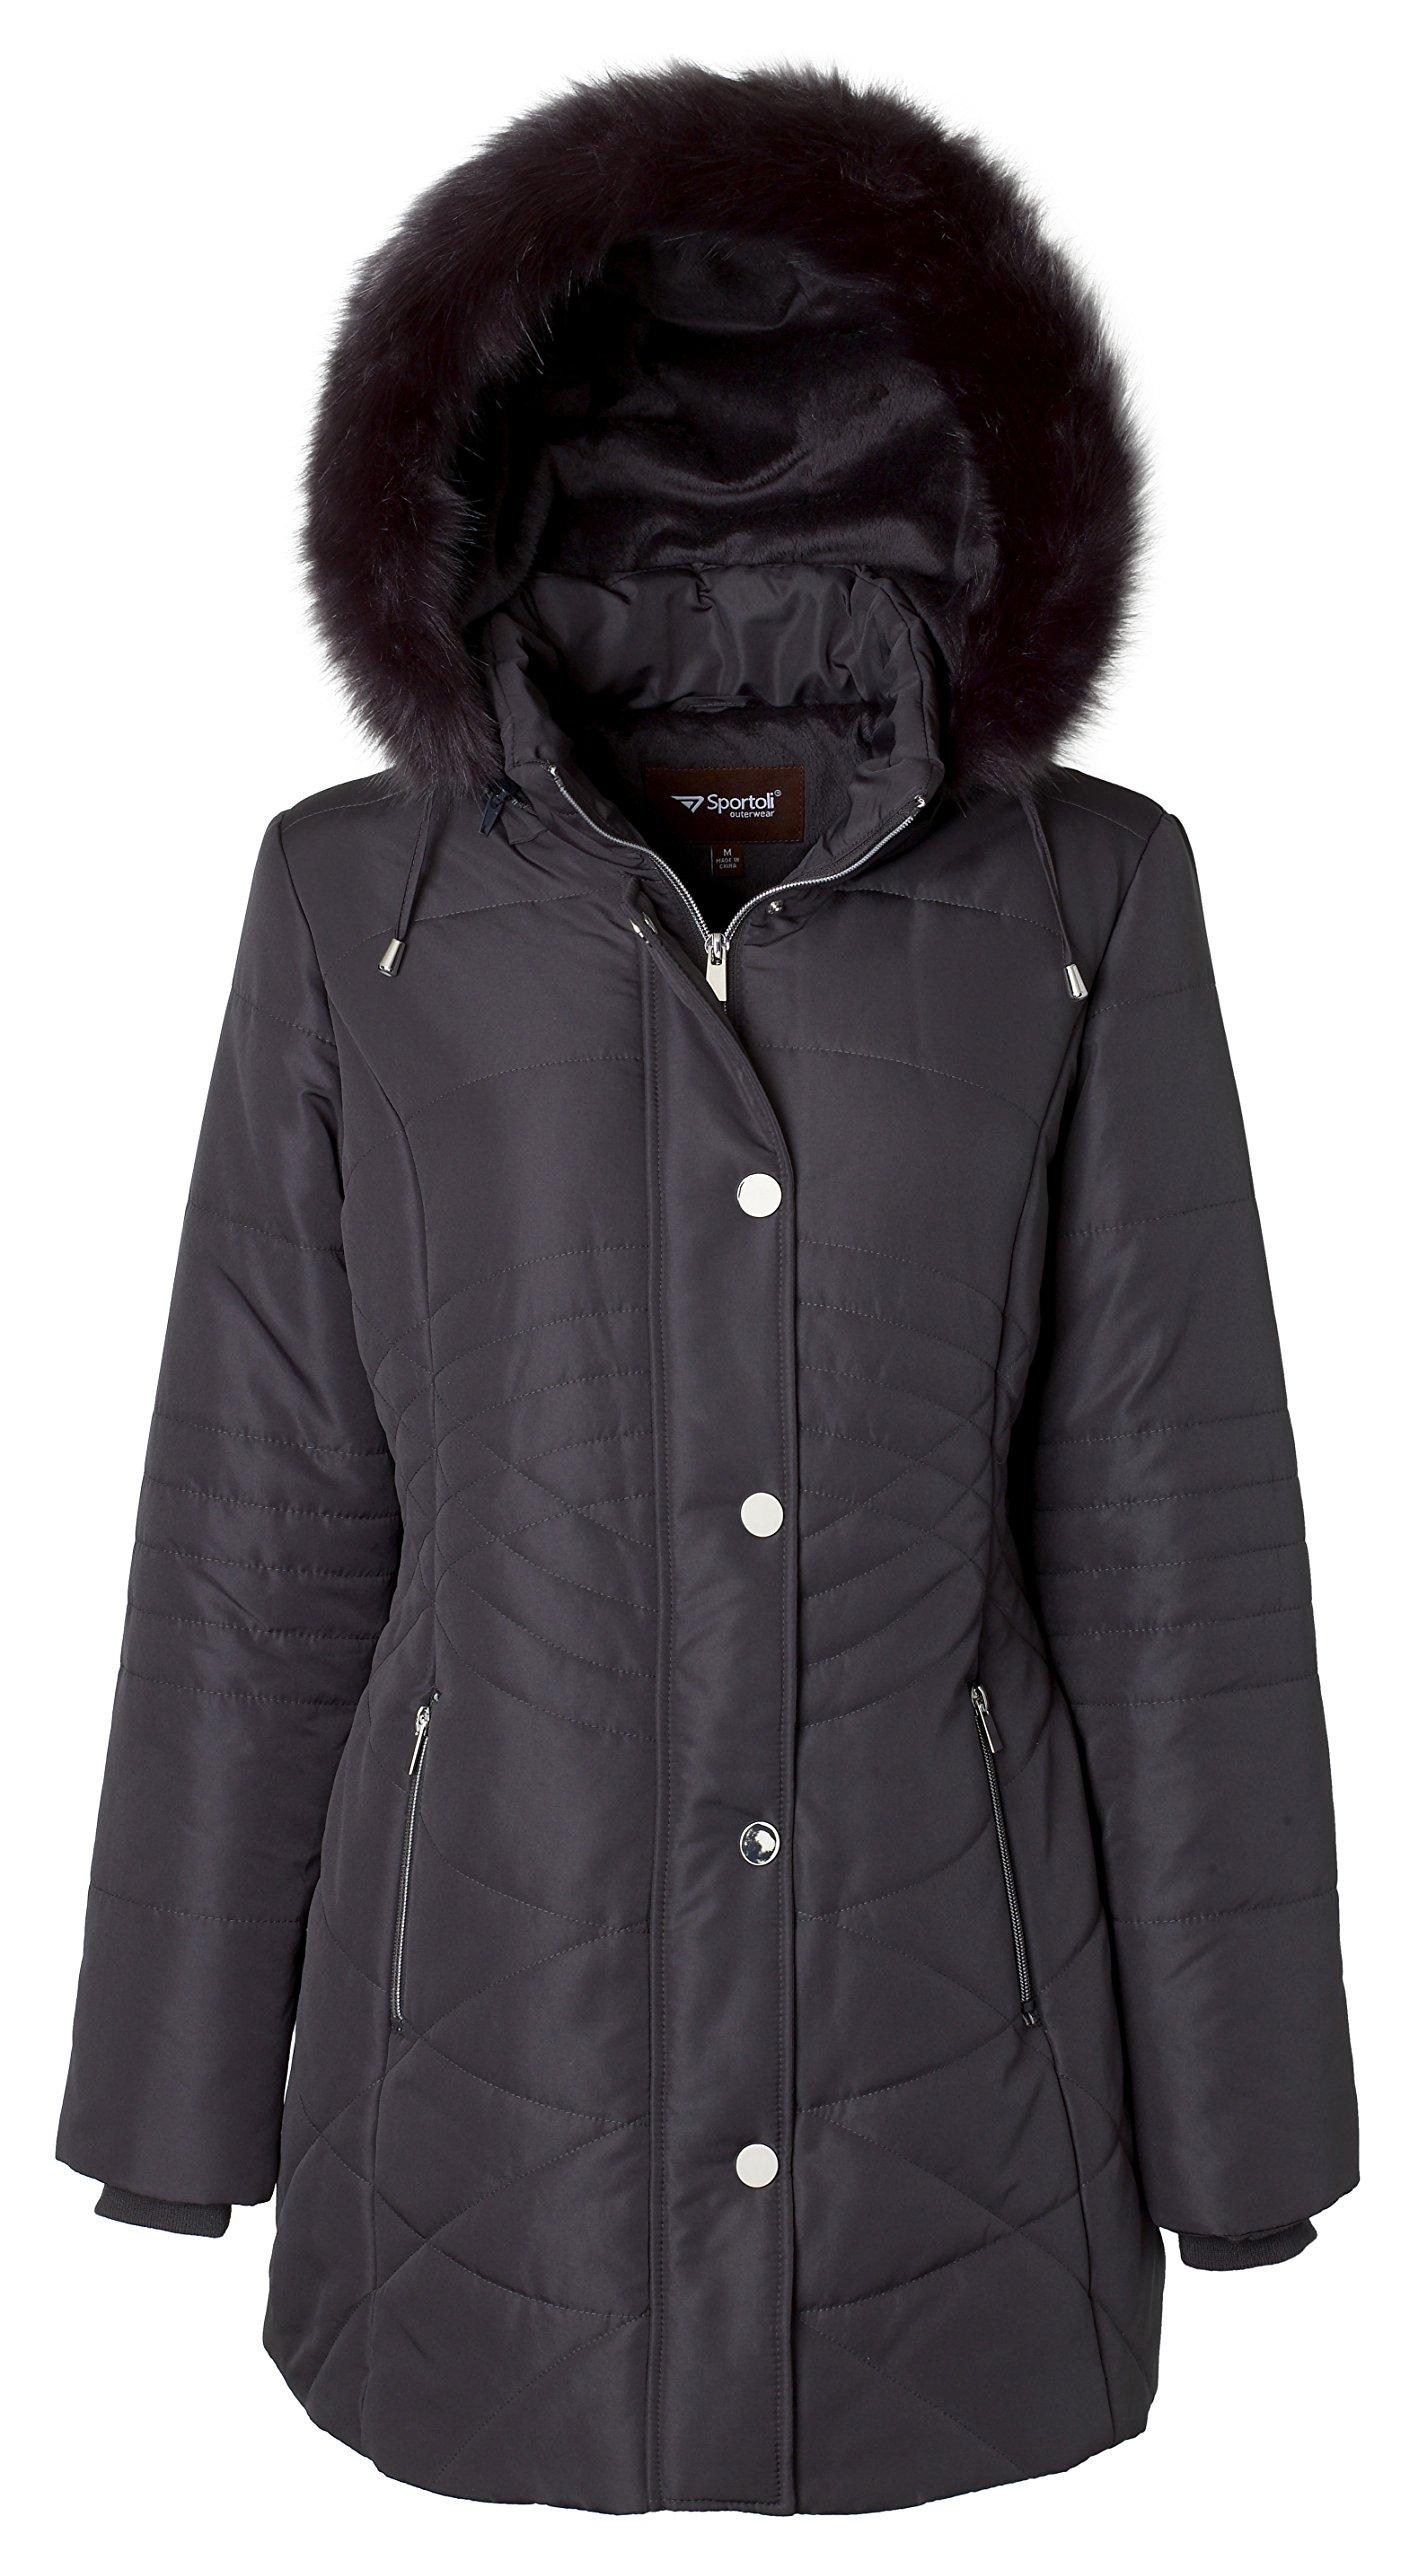 Sportoli Women's Longer Length Plush Lined Puffer Coat and Zip-off Detacheable Fur Trim Hood - Hematite (Large)